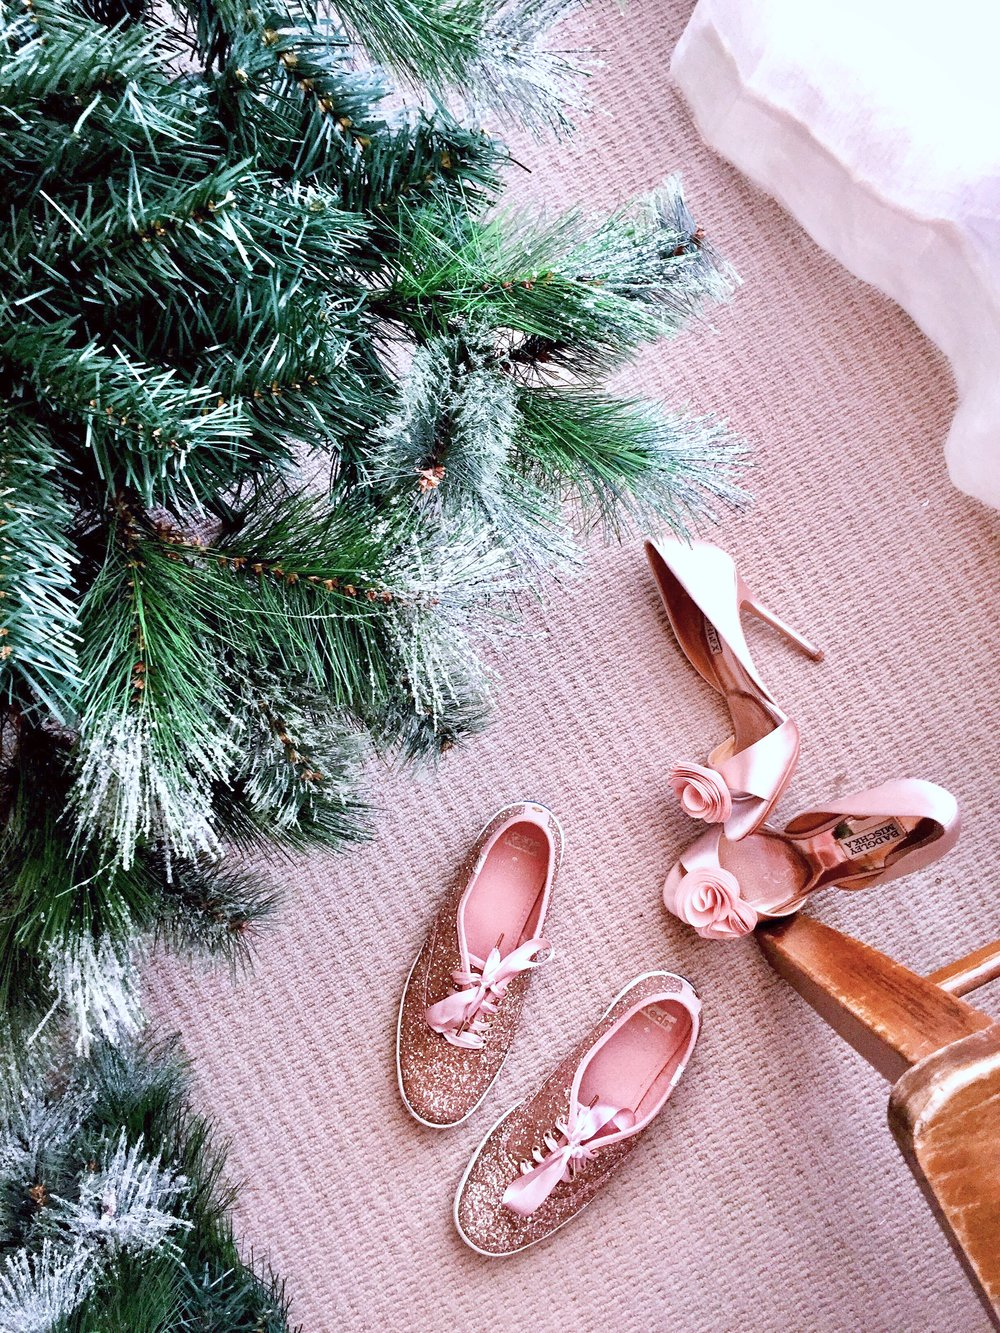 ChristmasShoes.jpg